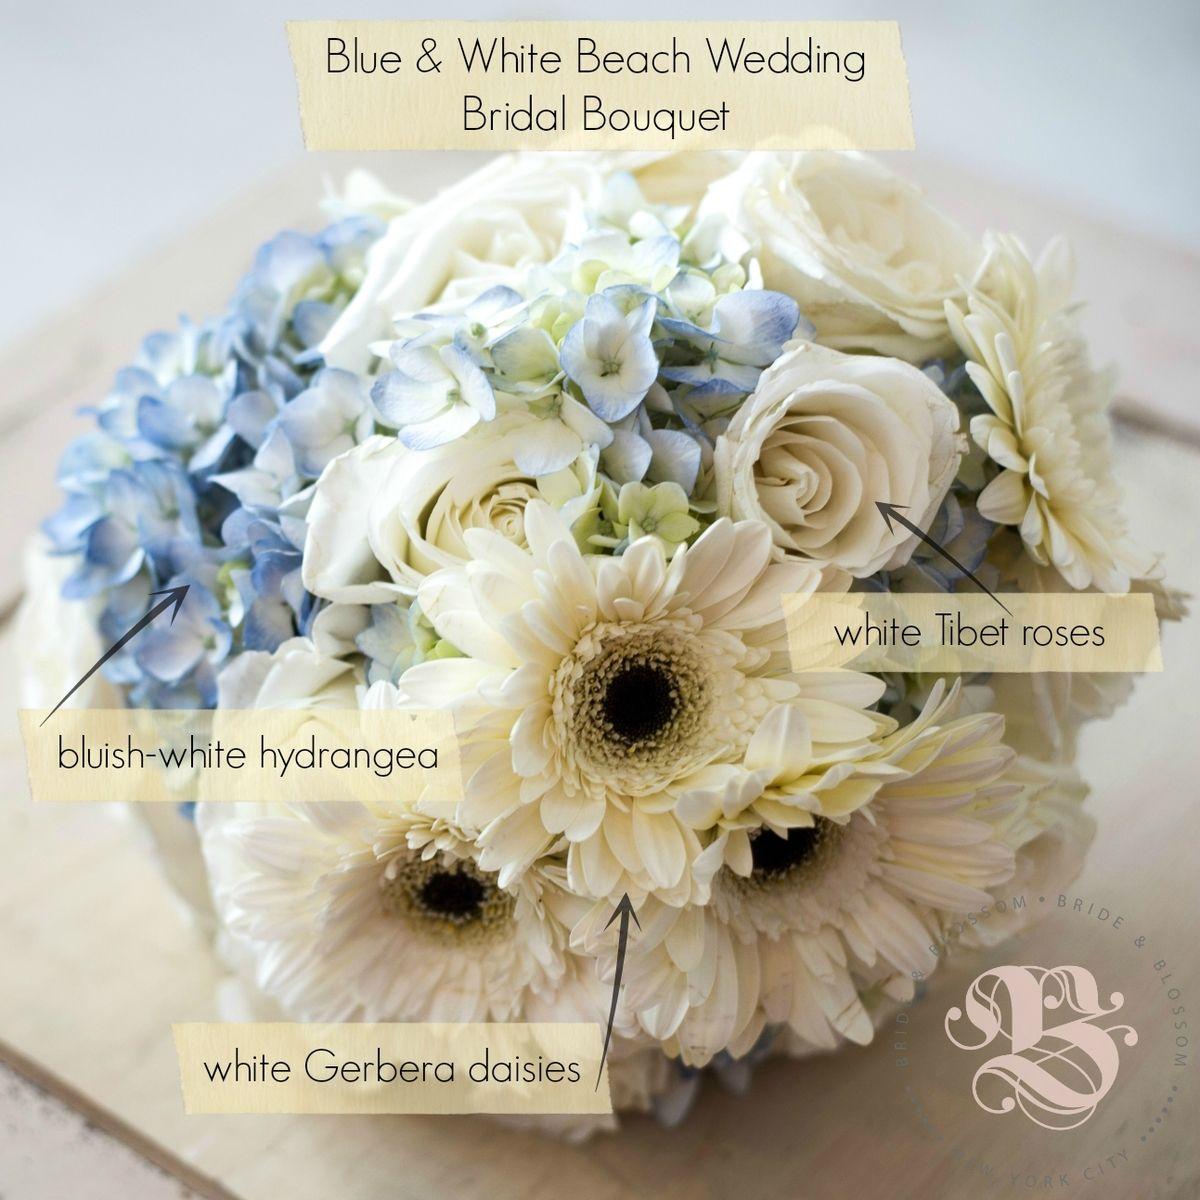 Blue white bridal bouquet recipe by bride blossom nycs only blue bridal bouquet recipe westhampton bath tennis dear stacey wedding photography1 izmirmasajfo Images